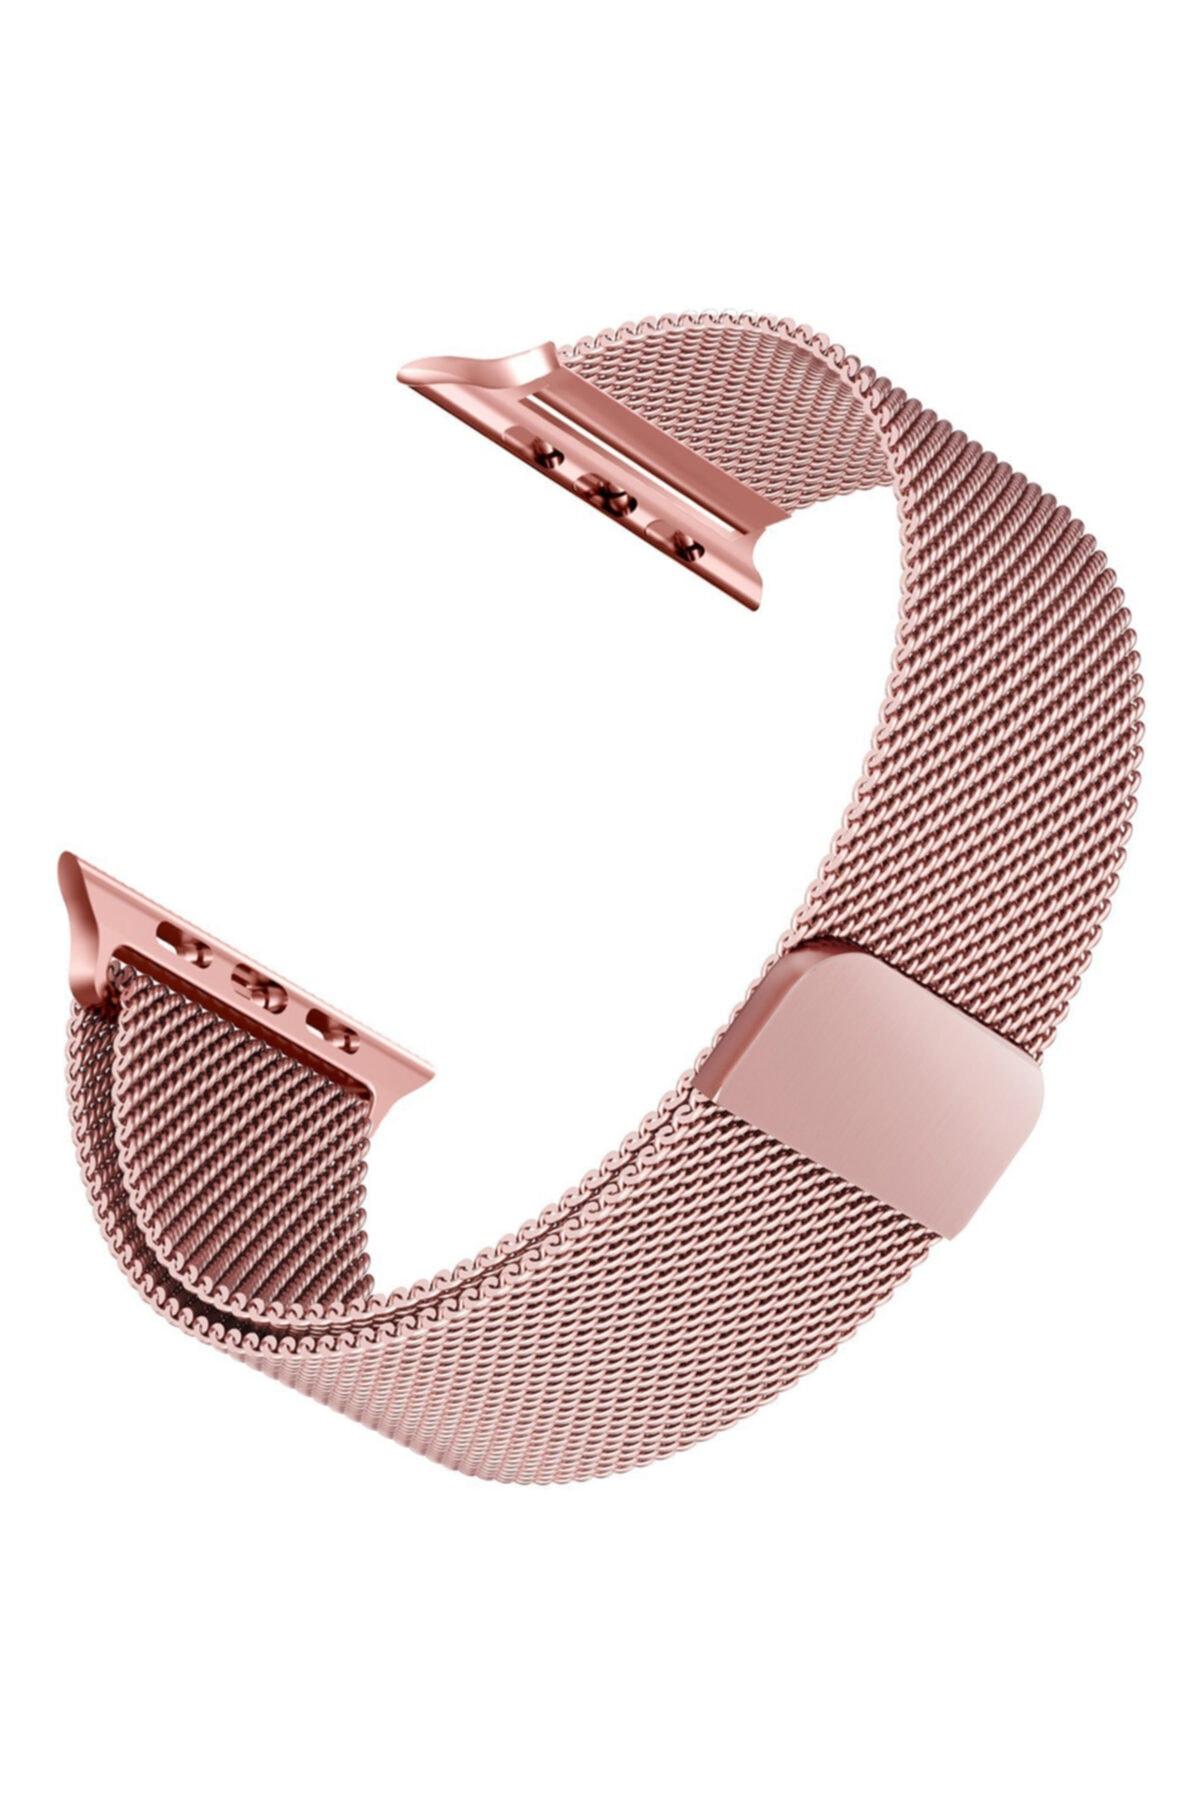 Microsonic Microsonic Watch 1 38mm Milanese Loop Kordon Rose Gold 1